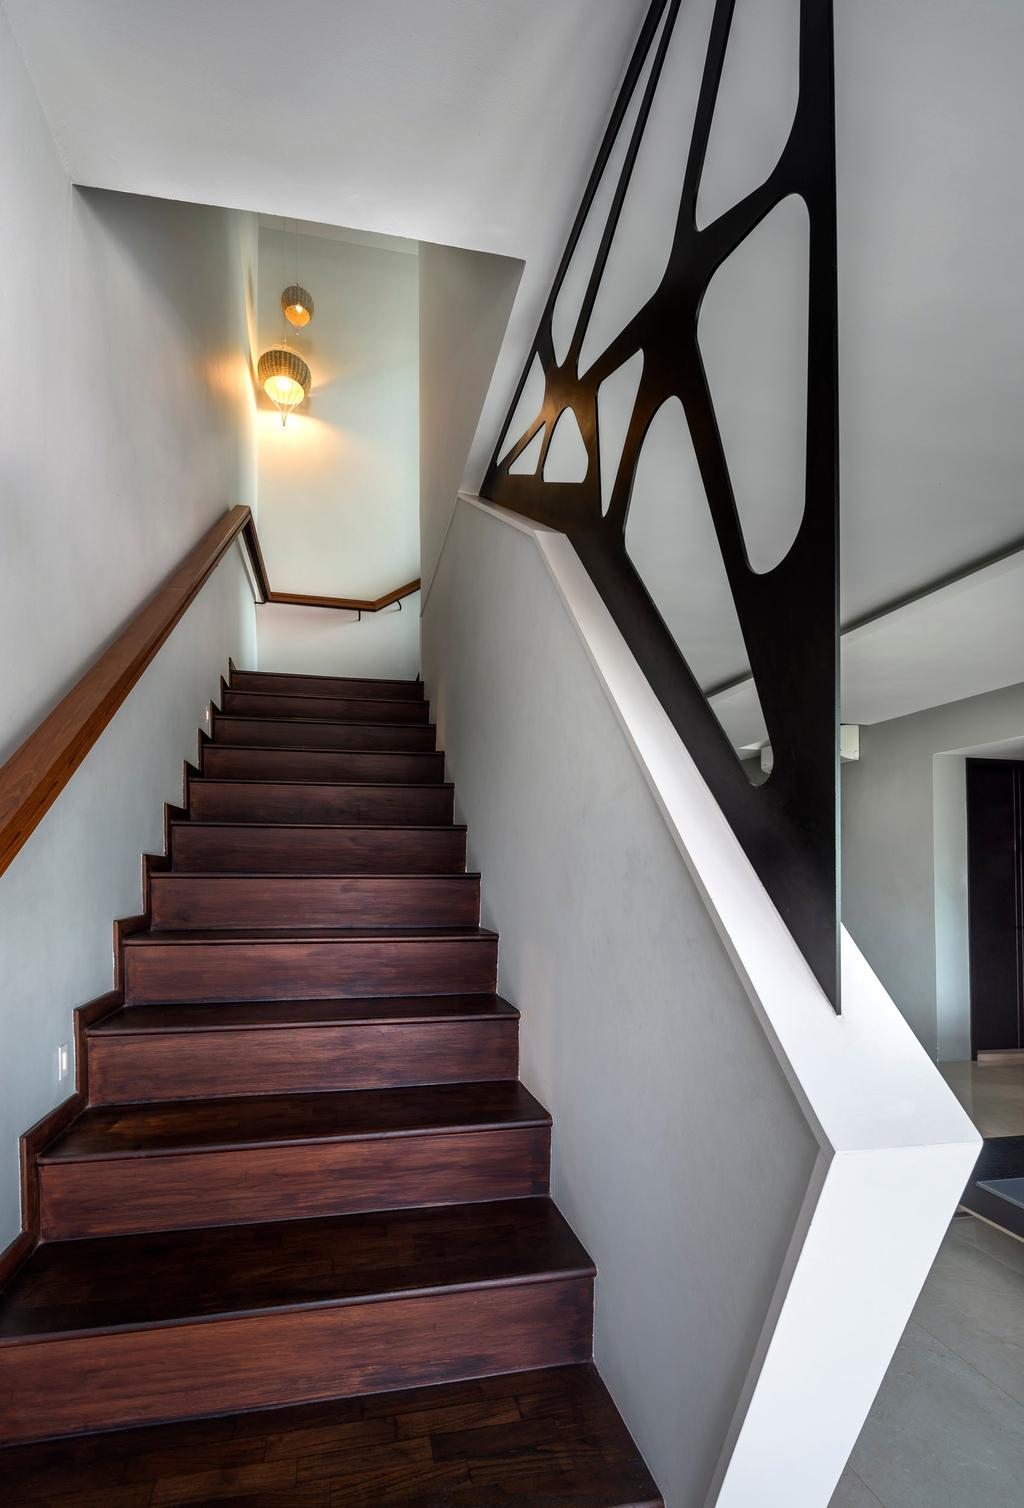 Contemporary, Condo, Hillview Avenue, Interior Designer, Prozfile Design, Wall Lamp, Wooden Steps, Wooden Railing, Banister, Handrail, Staircase